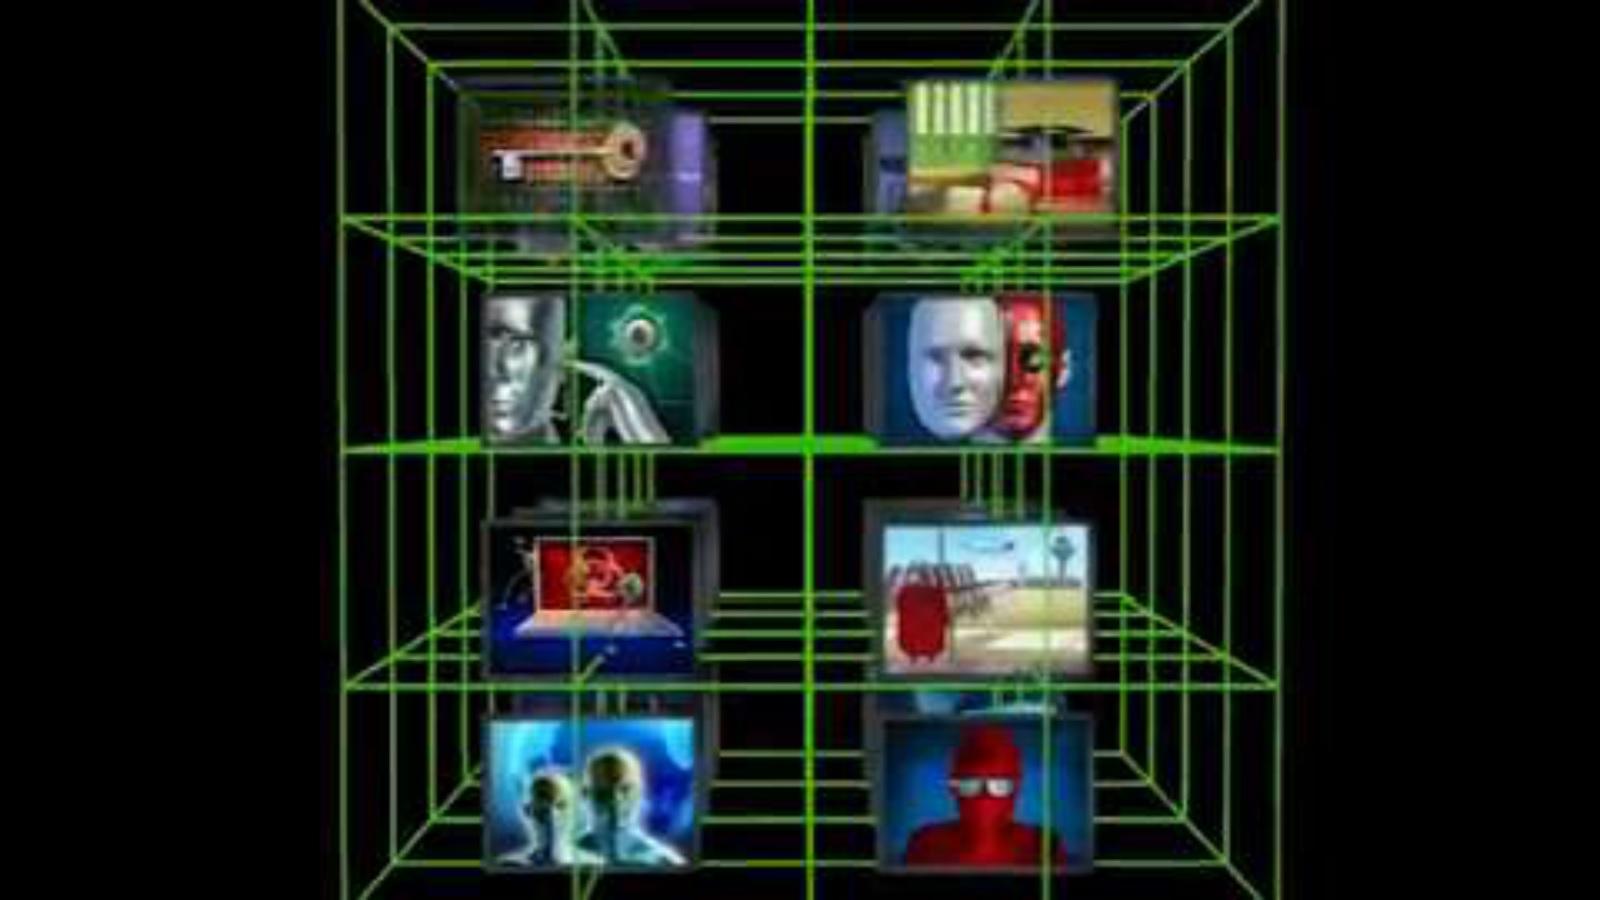 Introducing the Human Firewall